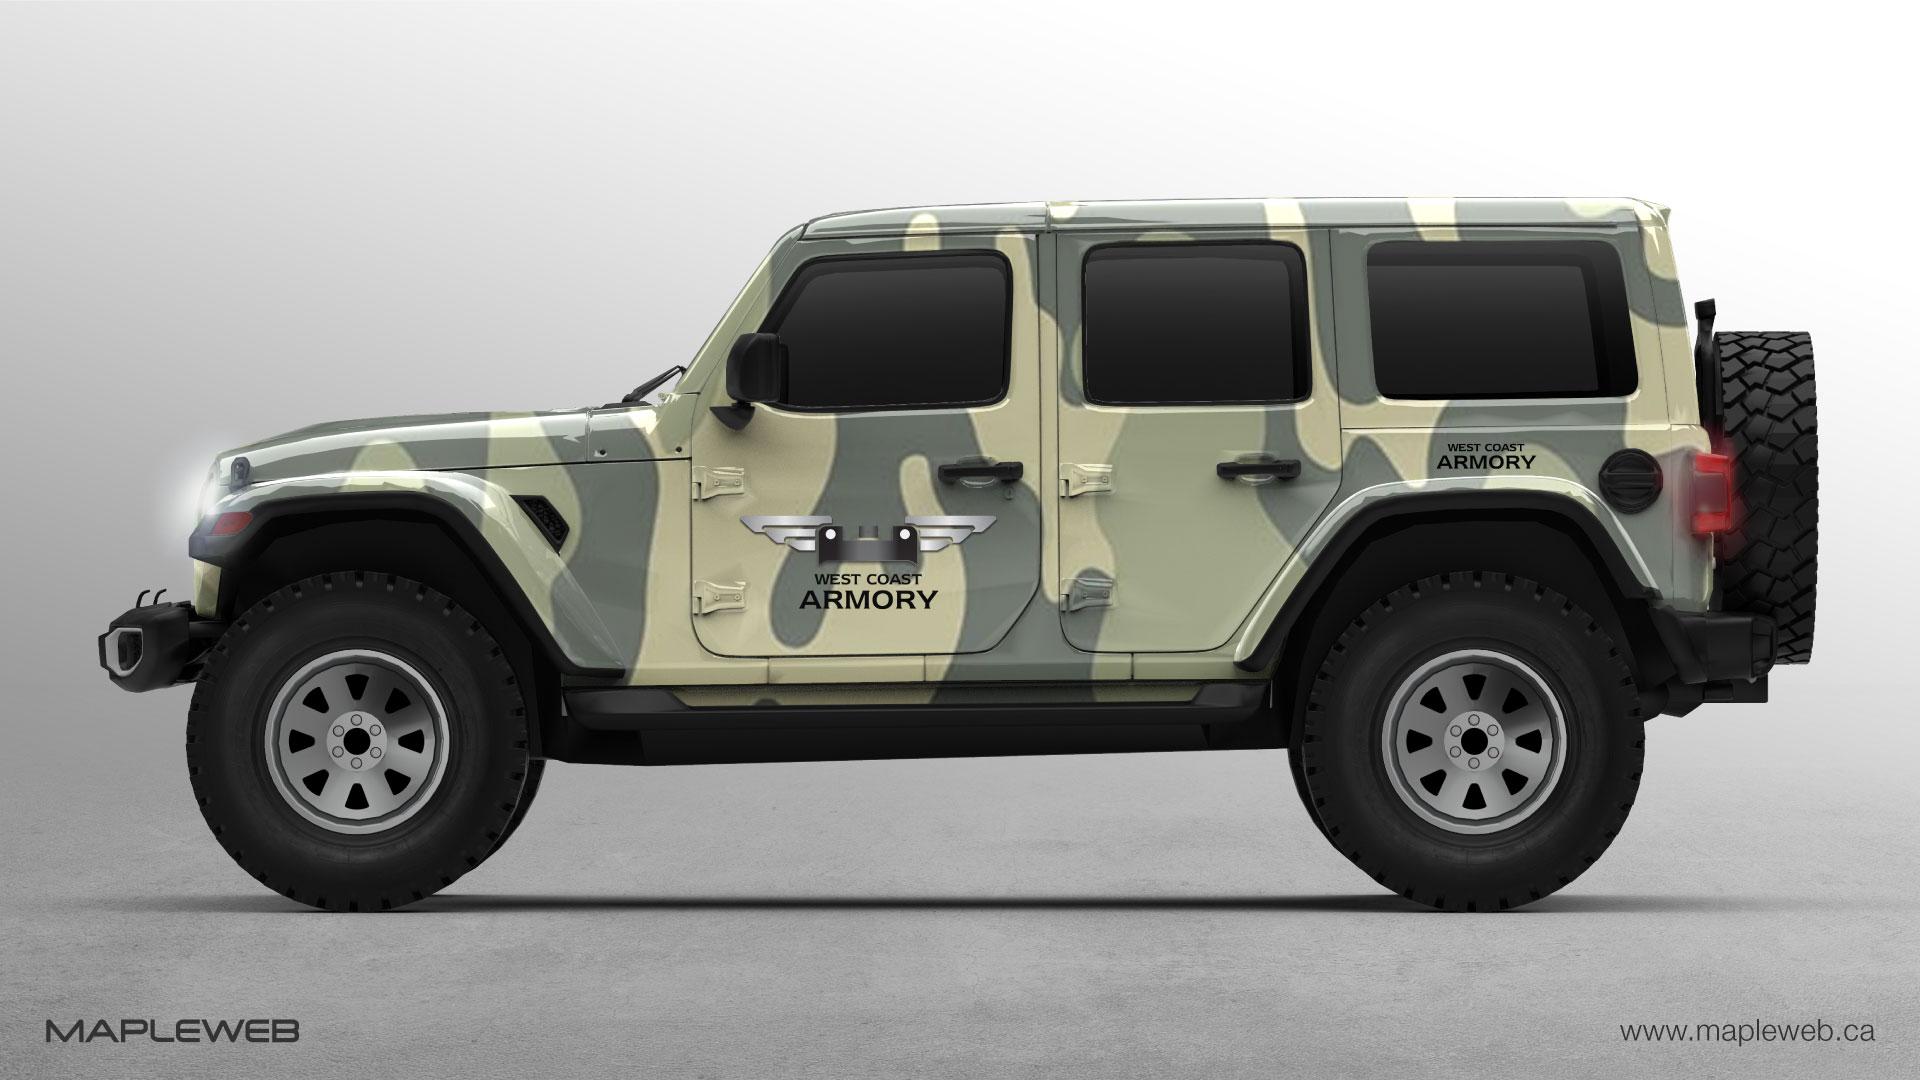 west-coast-armory-brand-logo-design-by-mapleweb-vancouver-canada-aromory-jeep-mock